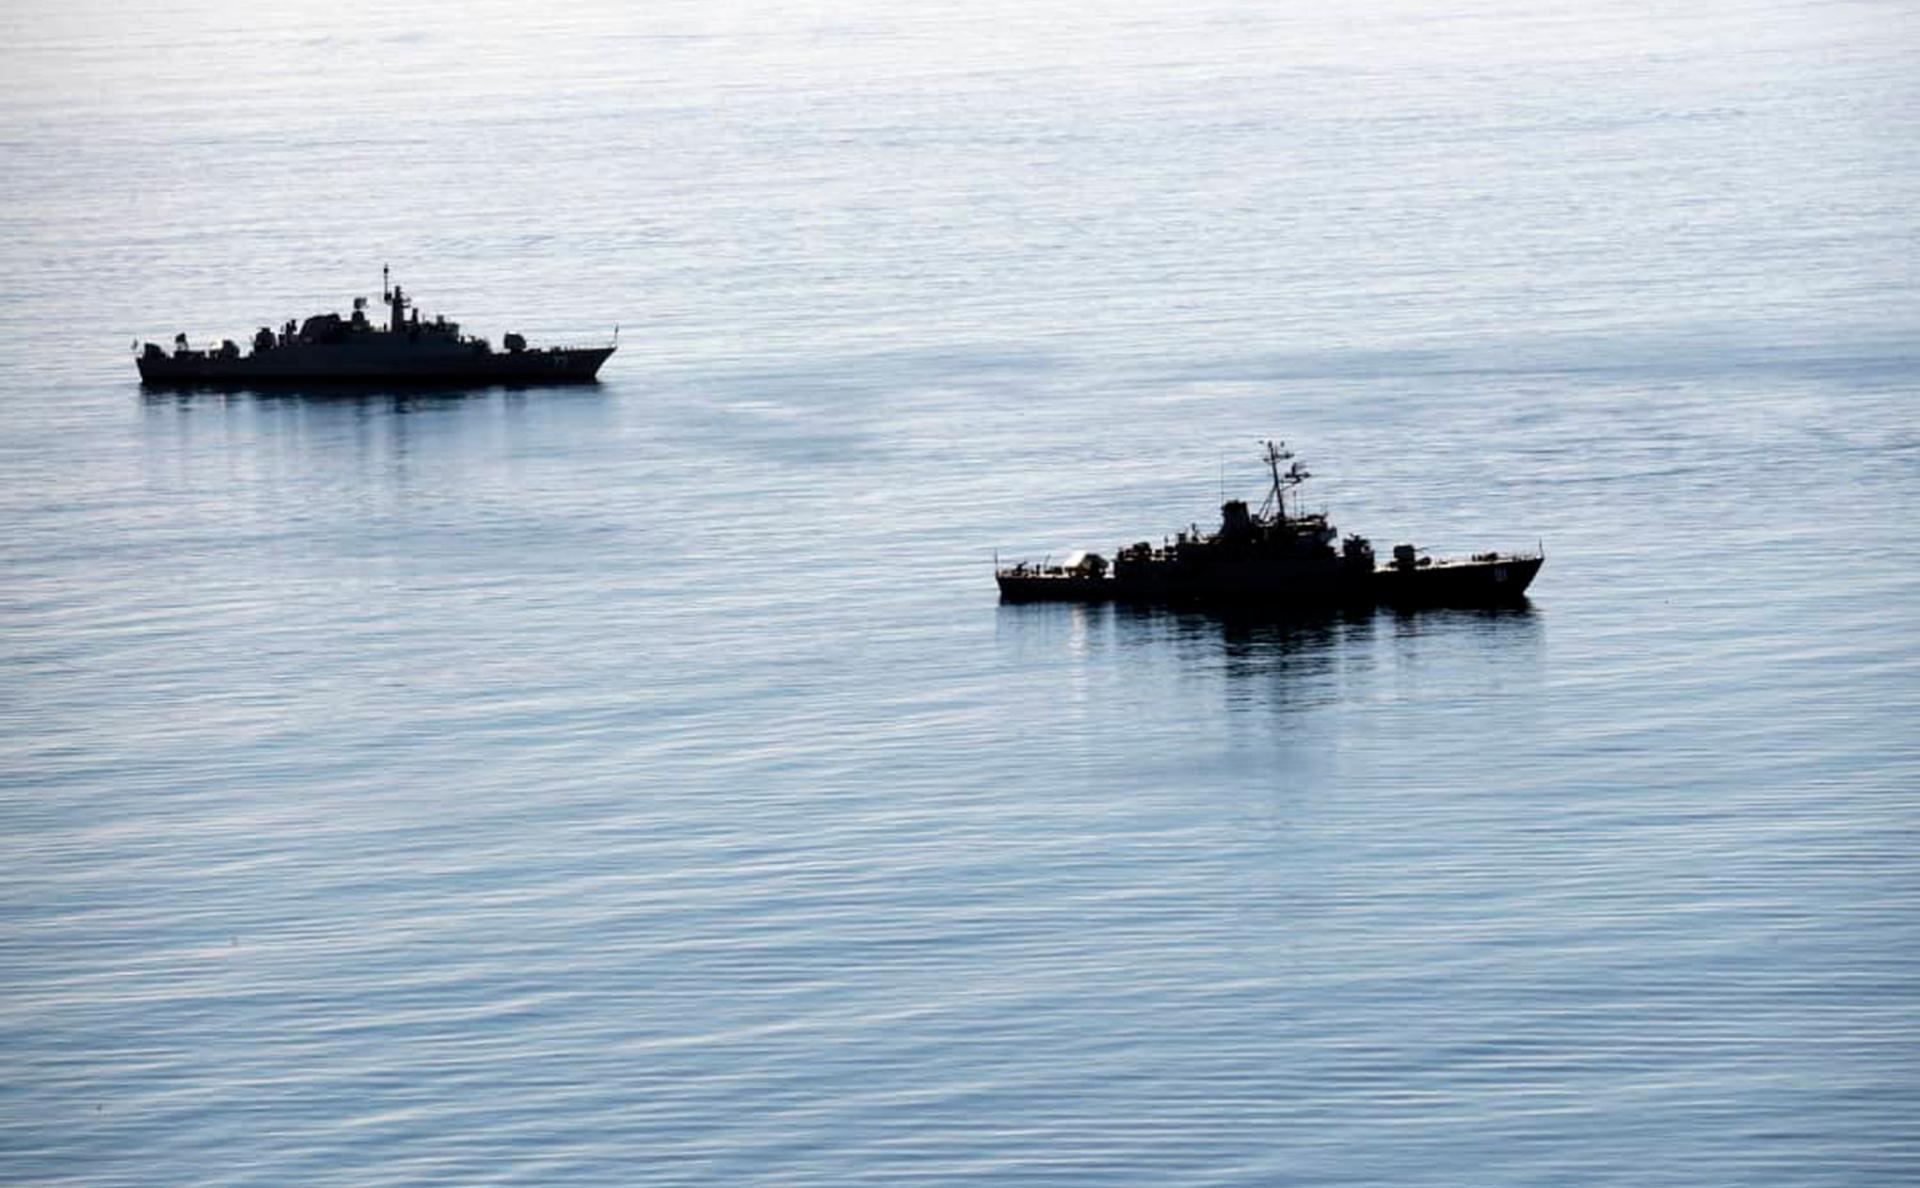 Фото: Iranian Army / AP